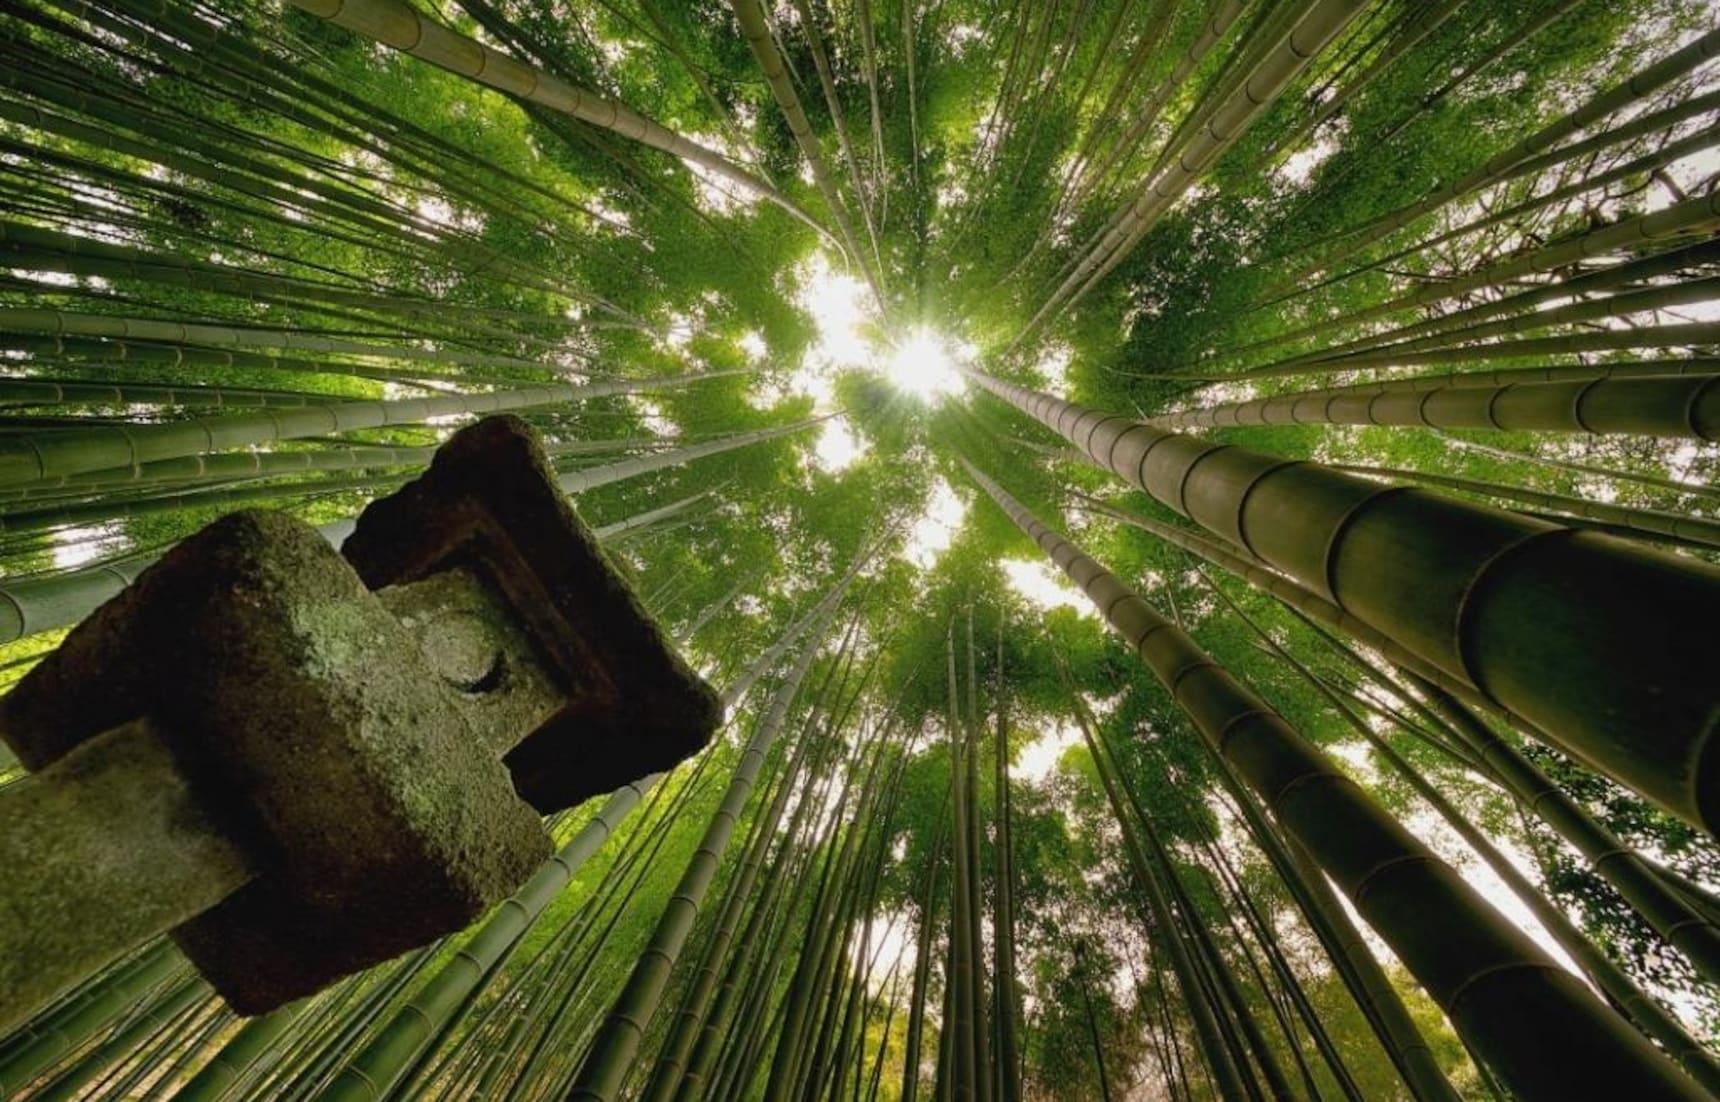 Hokokuji: The Bamboo Temple of Kamakura